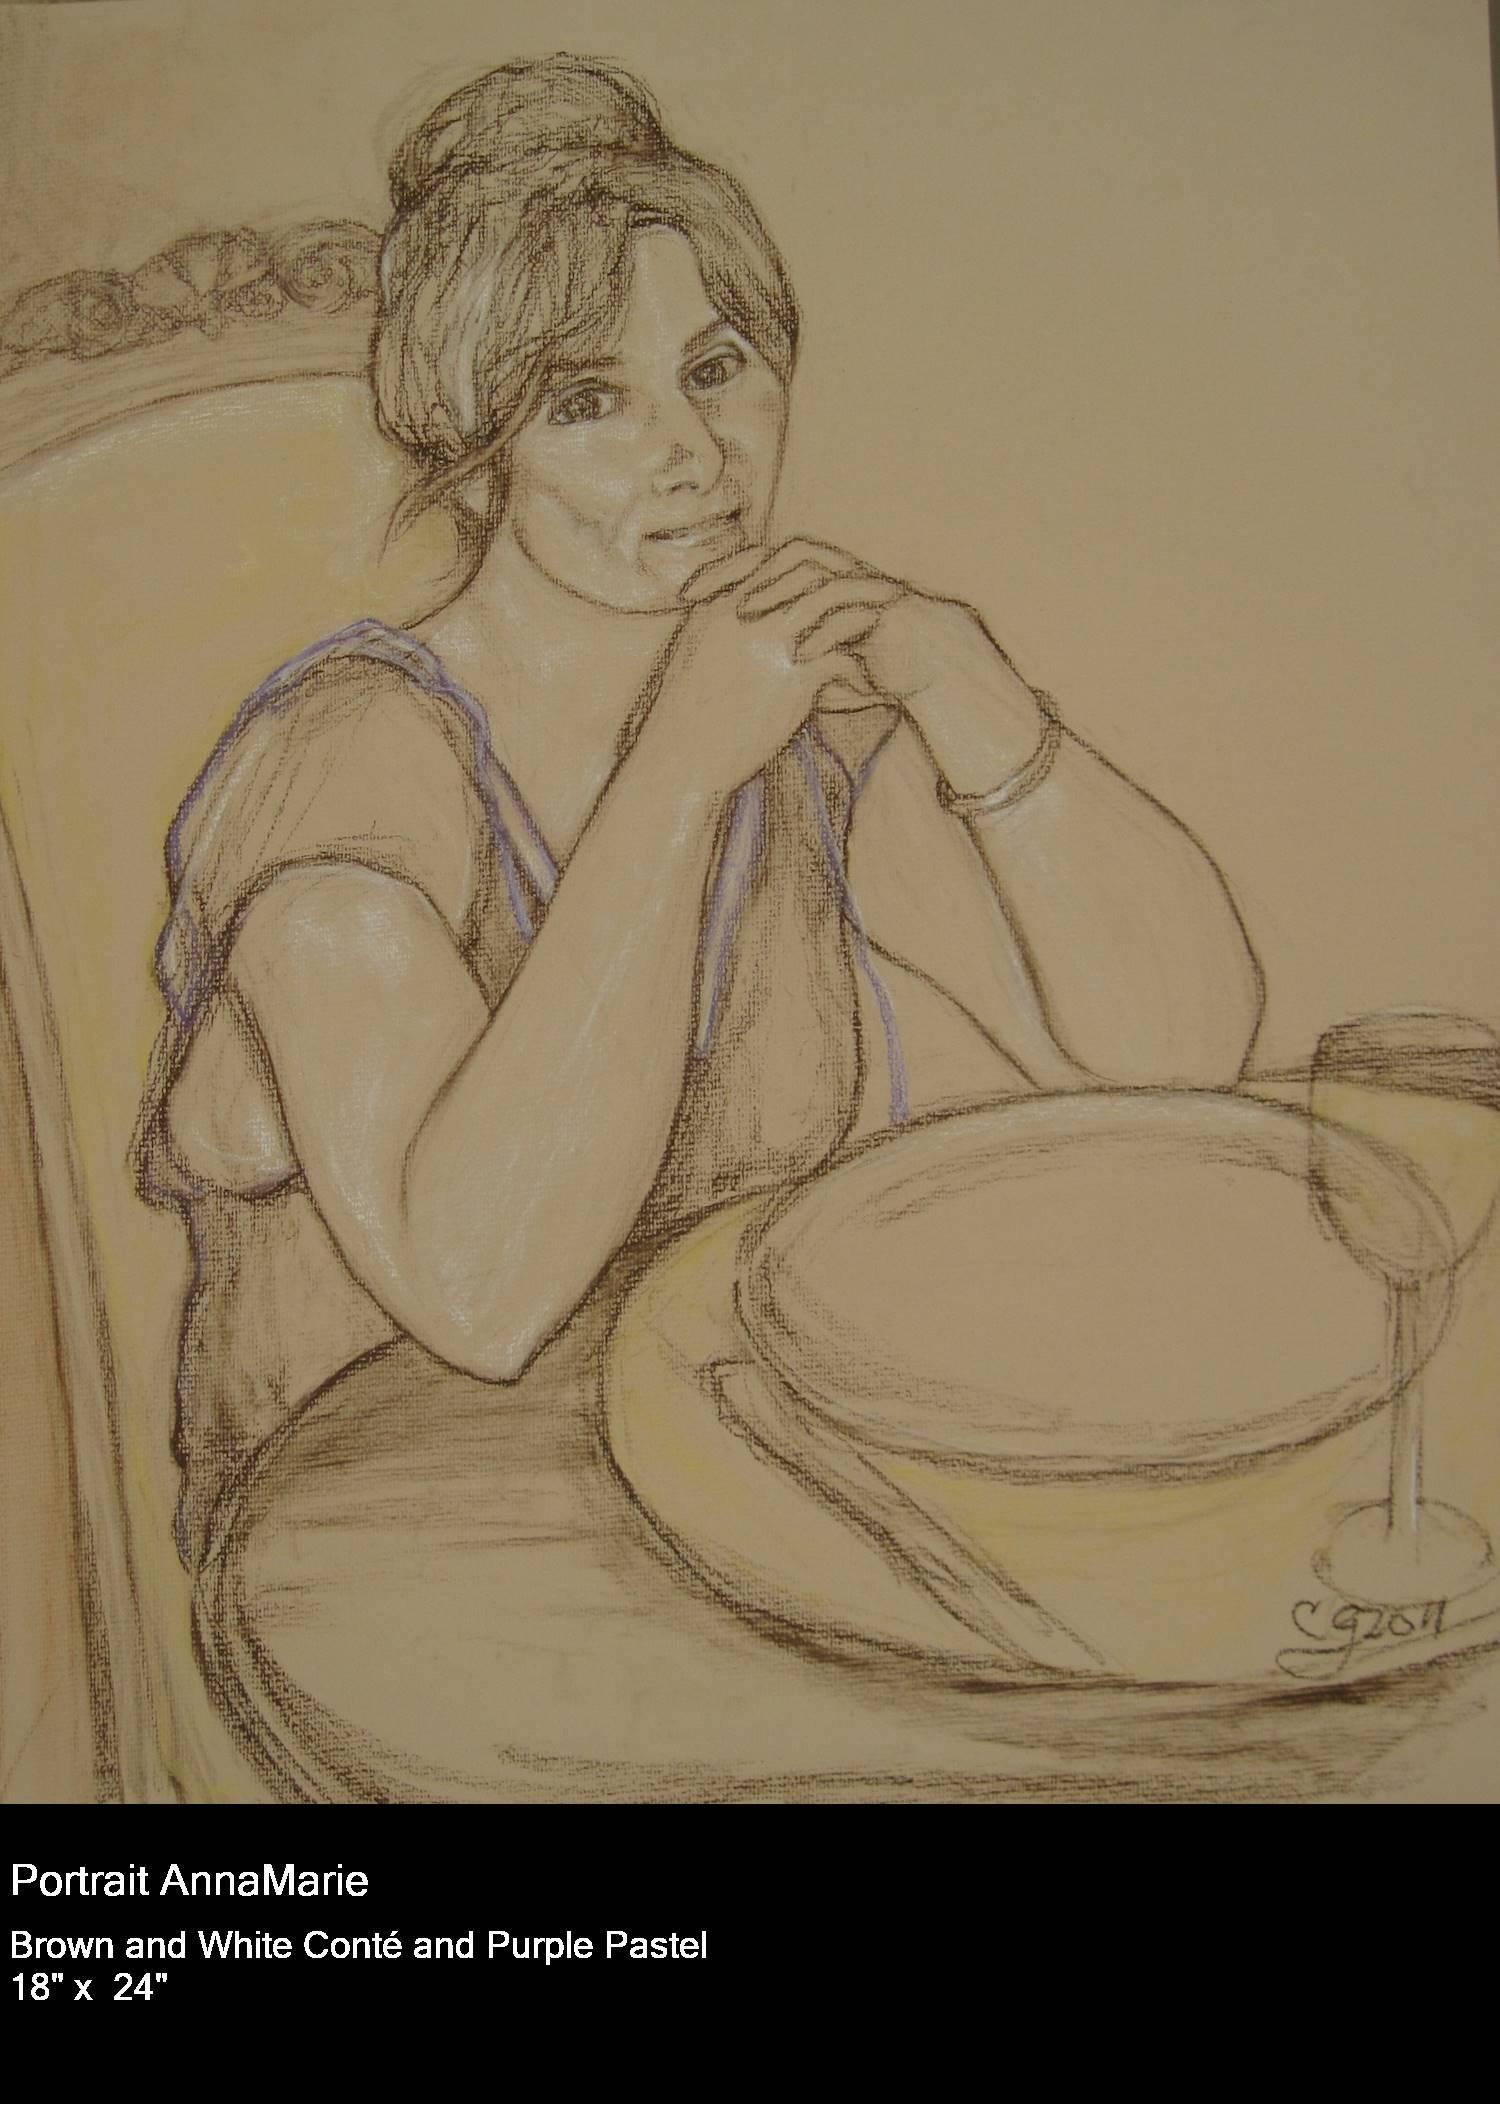 07 2nd Portrait Annamarie 18 X 24 -ss.jpg